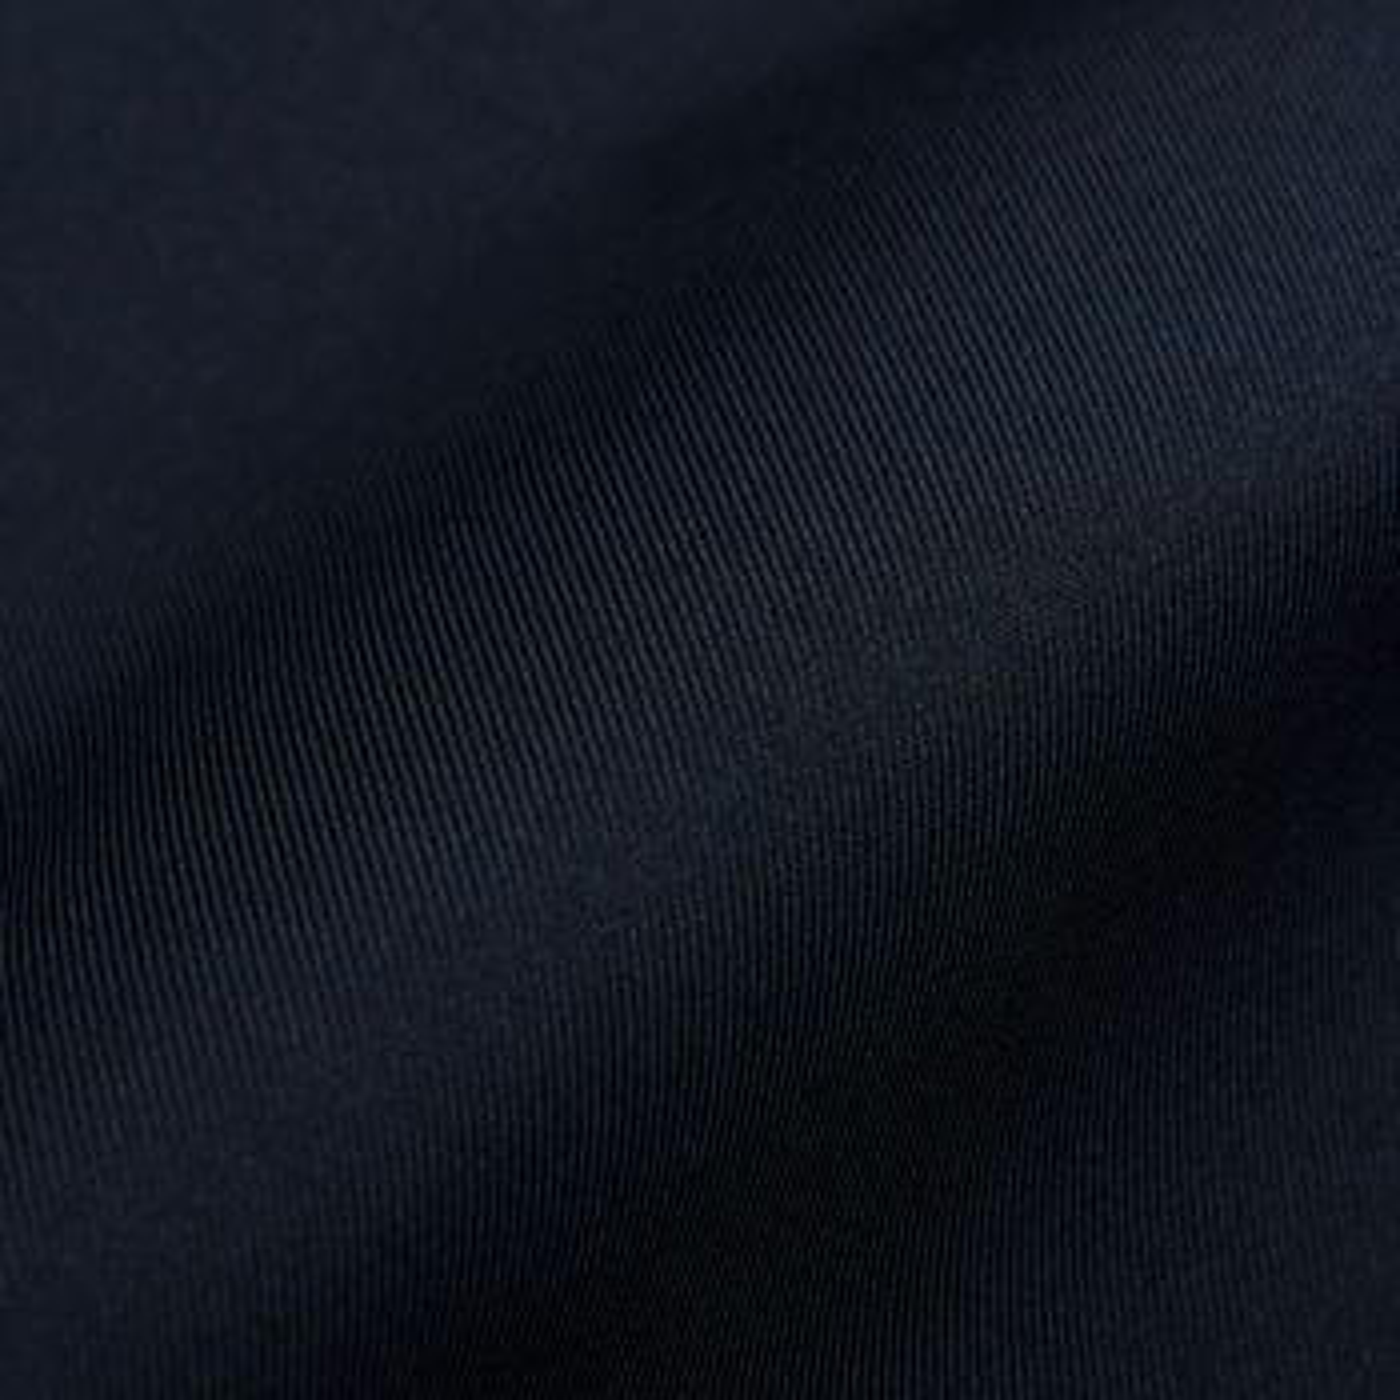 Schneiders Navy Technical Nylon Field Jacket Fabric